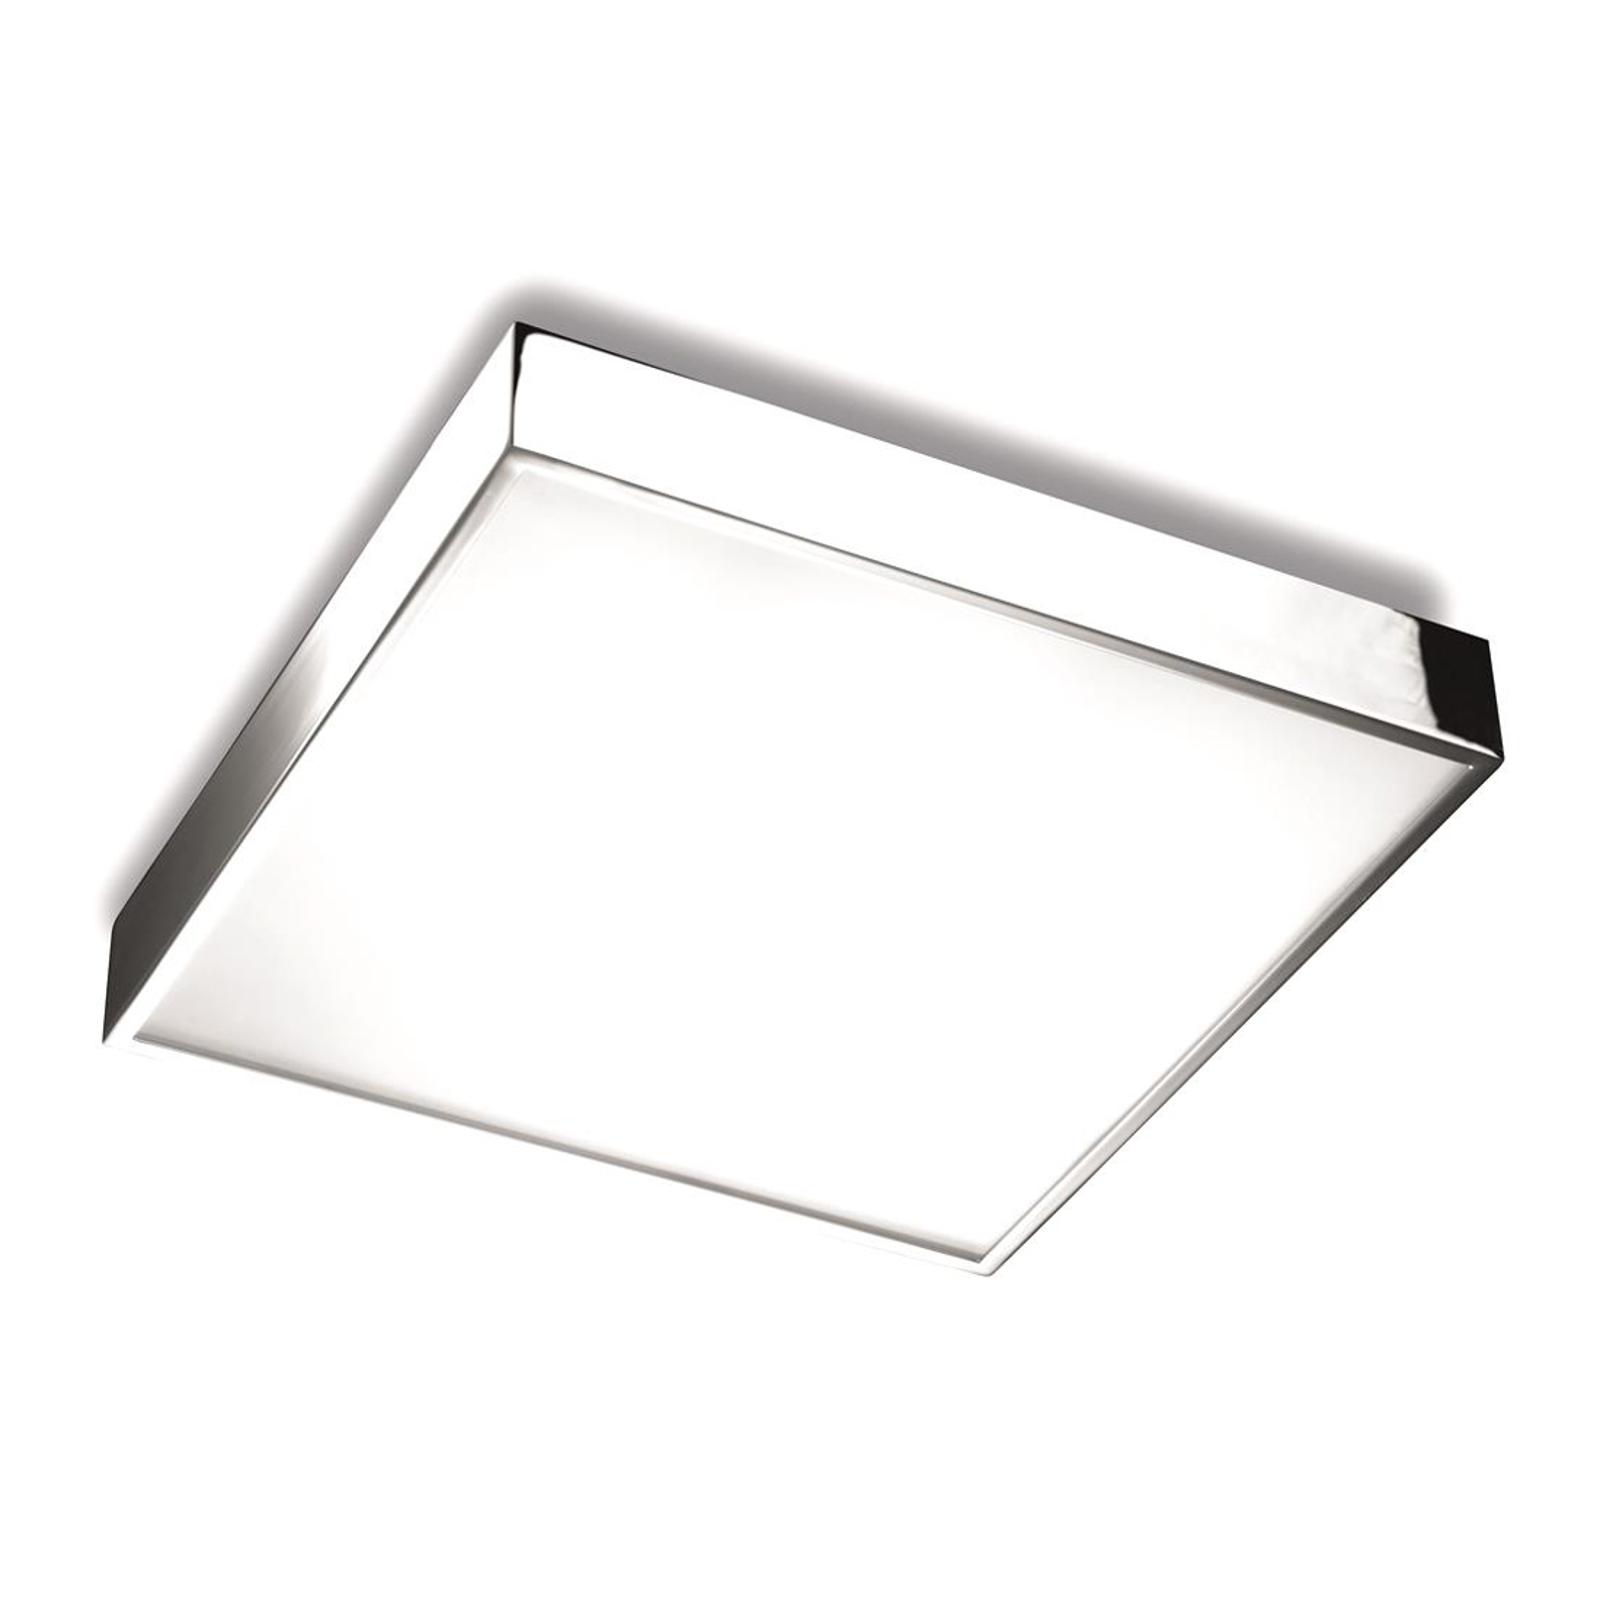 Quadratische LED-Deckenlampe Apolo IP20